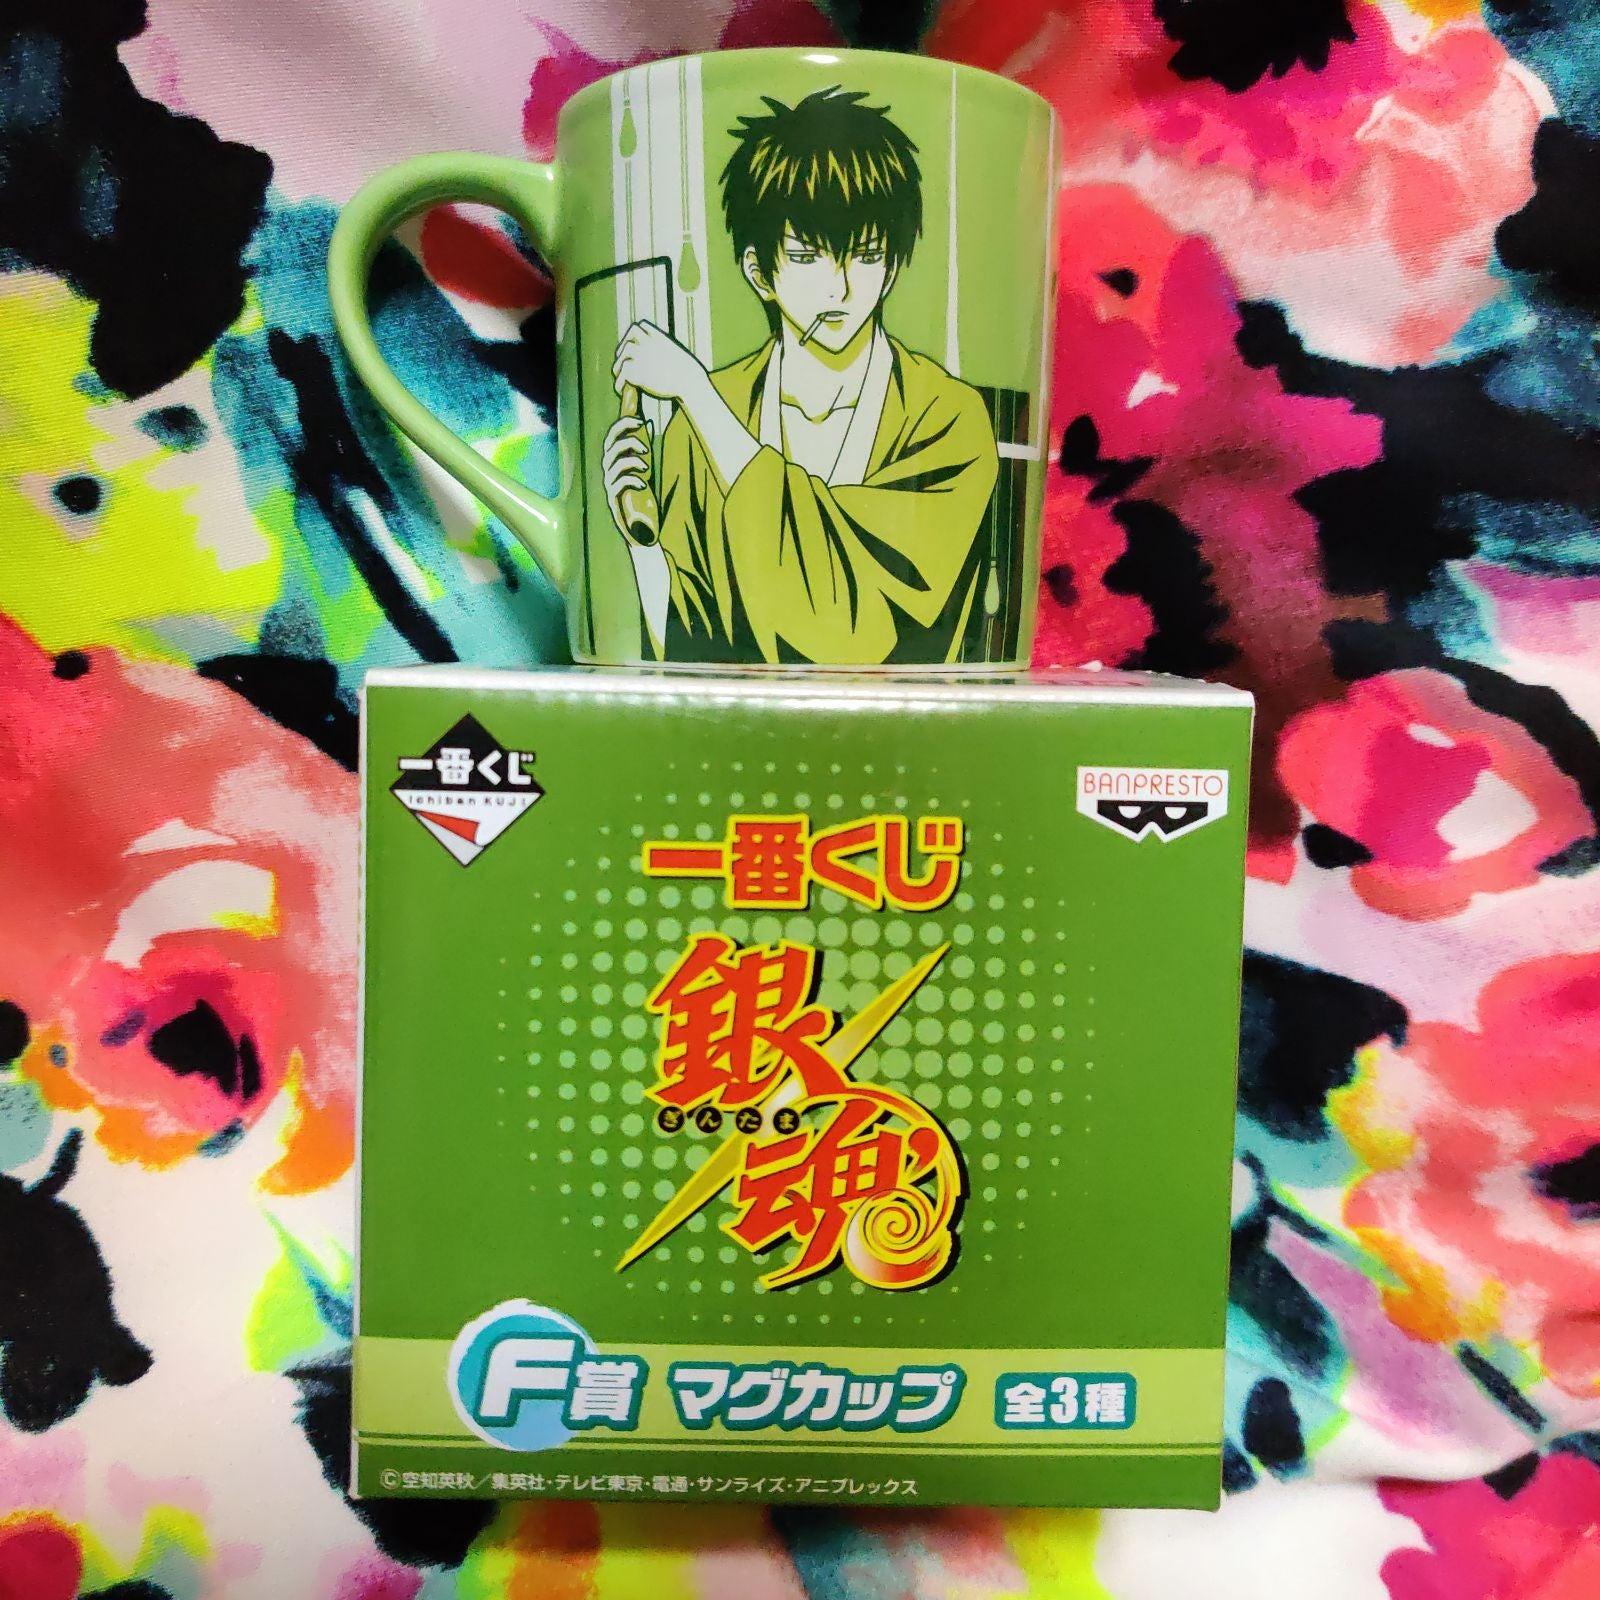 Hijikata & Sougo Gintama Small Mug Cup